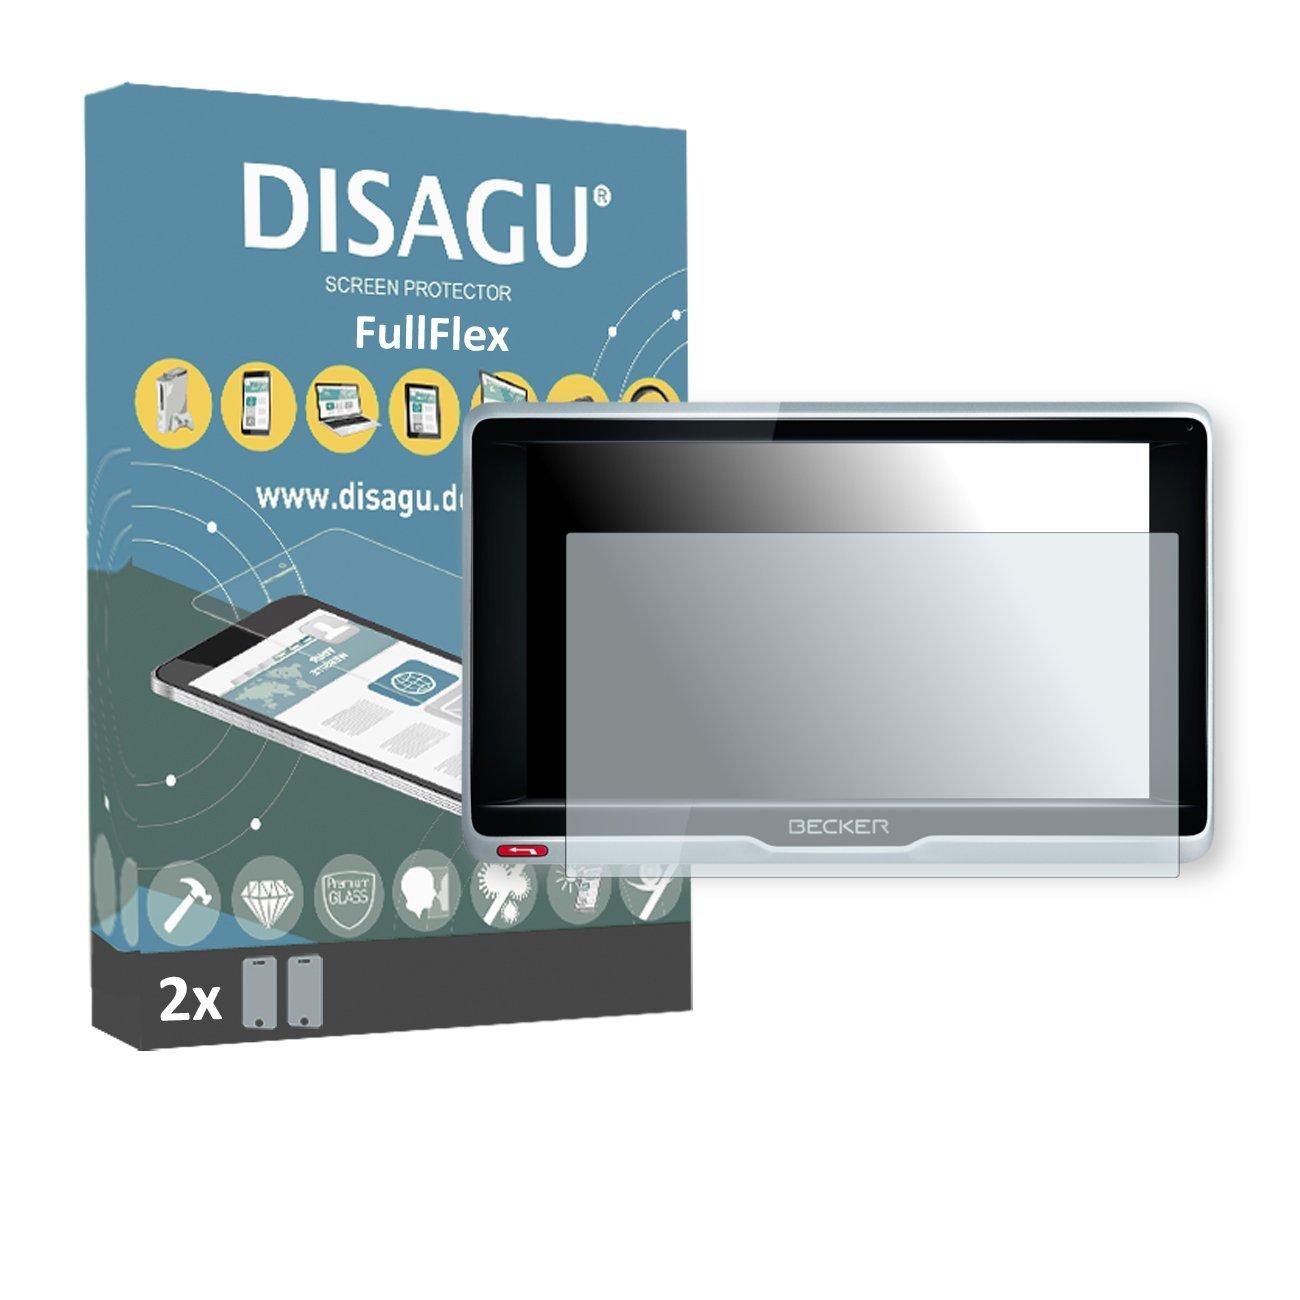 2 x Disagu FullFlex screen protector for Becker Professional.6 LMU foil screen protector